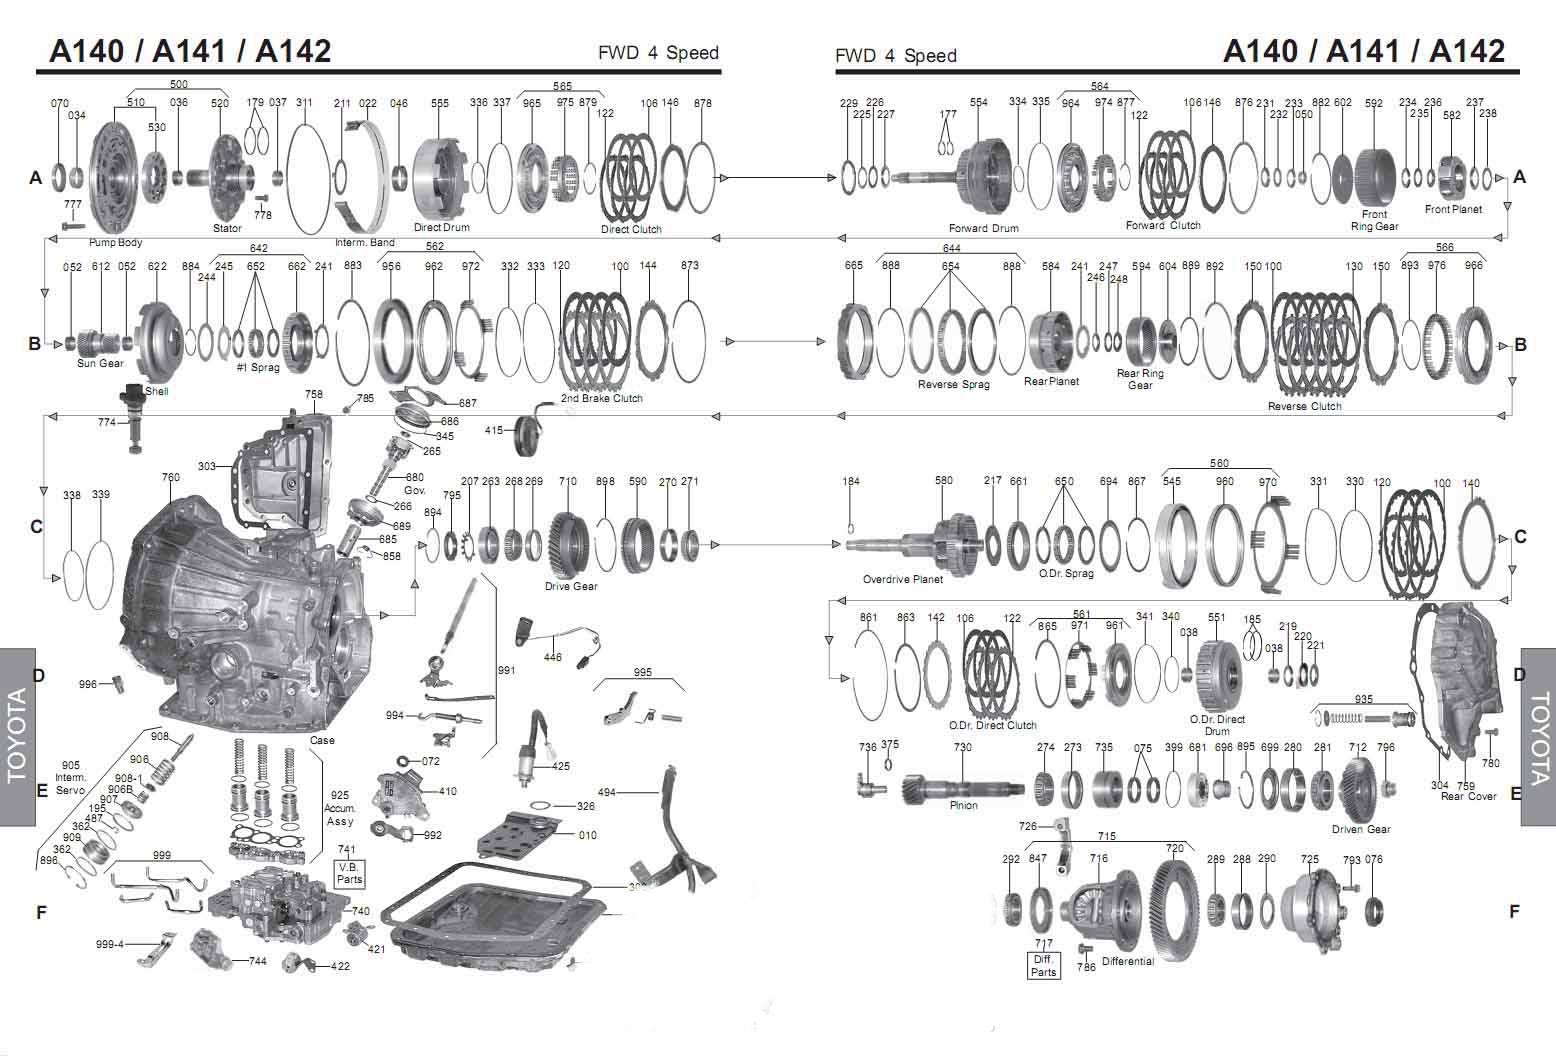 Transmission Repair Manuals A140